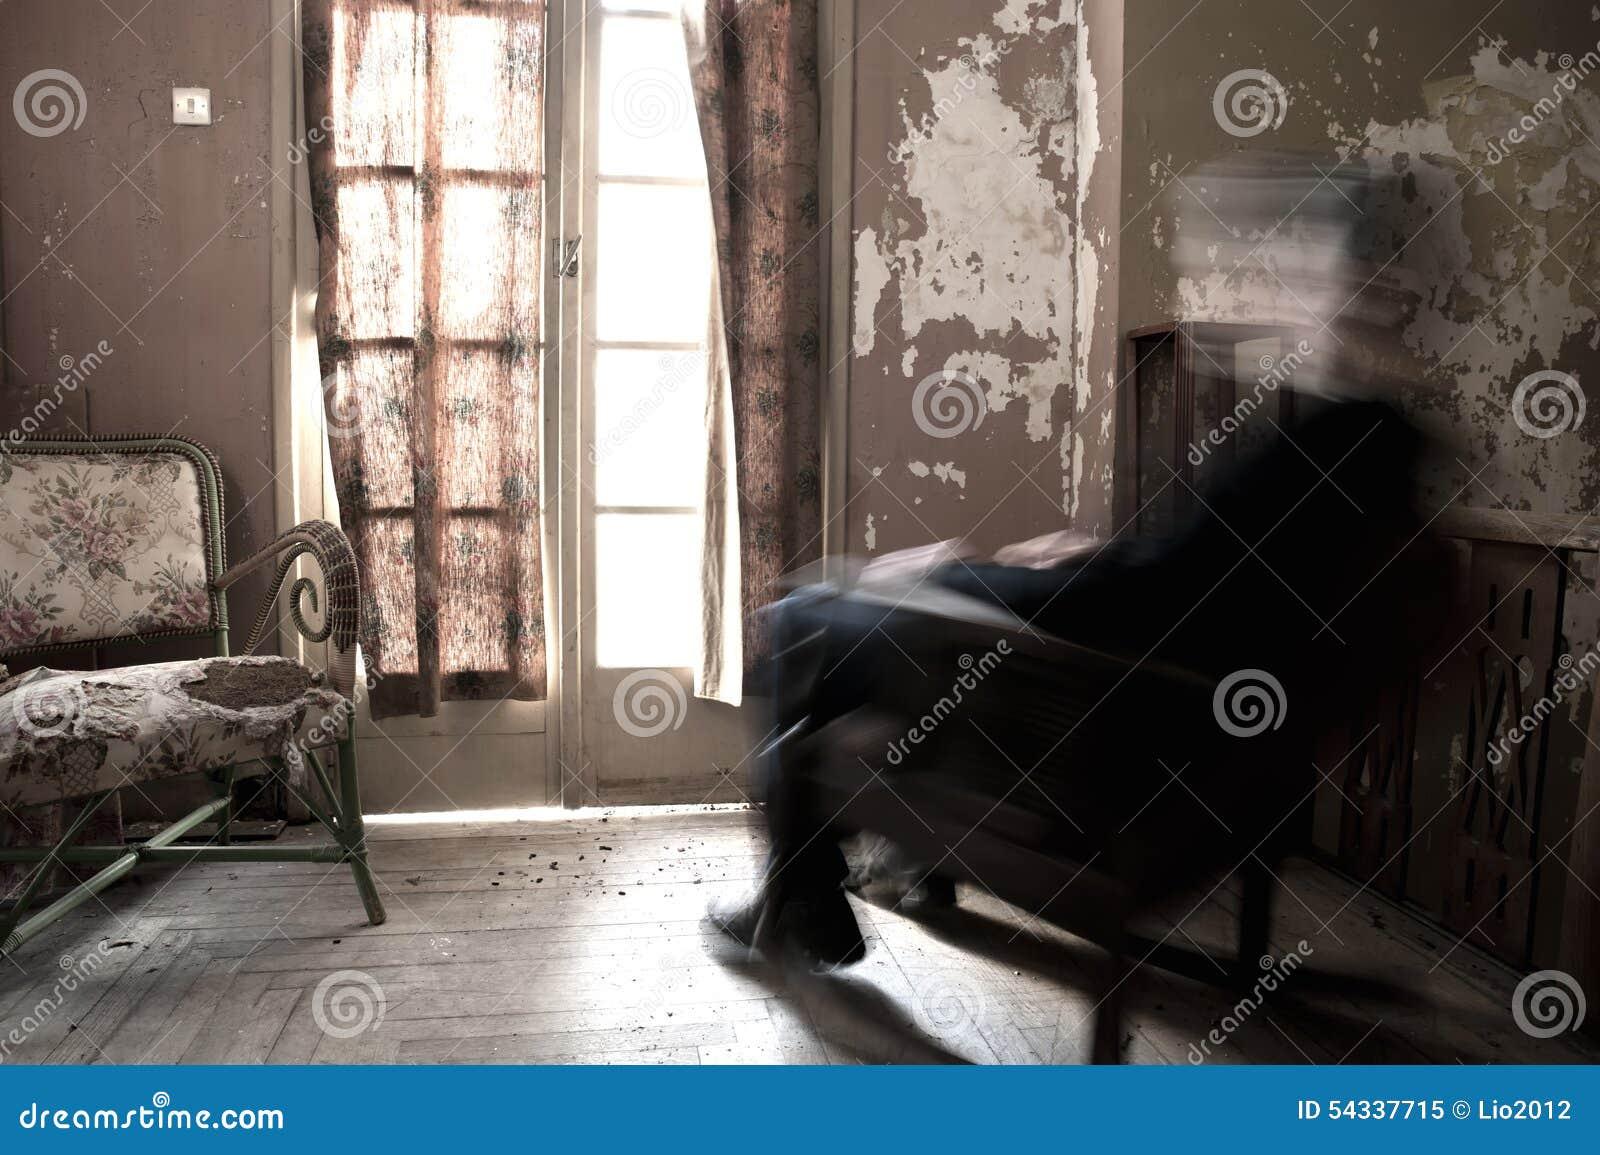 Man Sitting On Rocking Chair Stock Photo - Image: 54337715